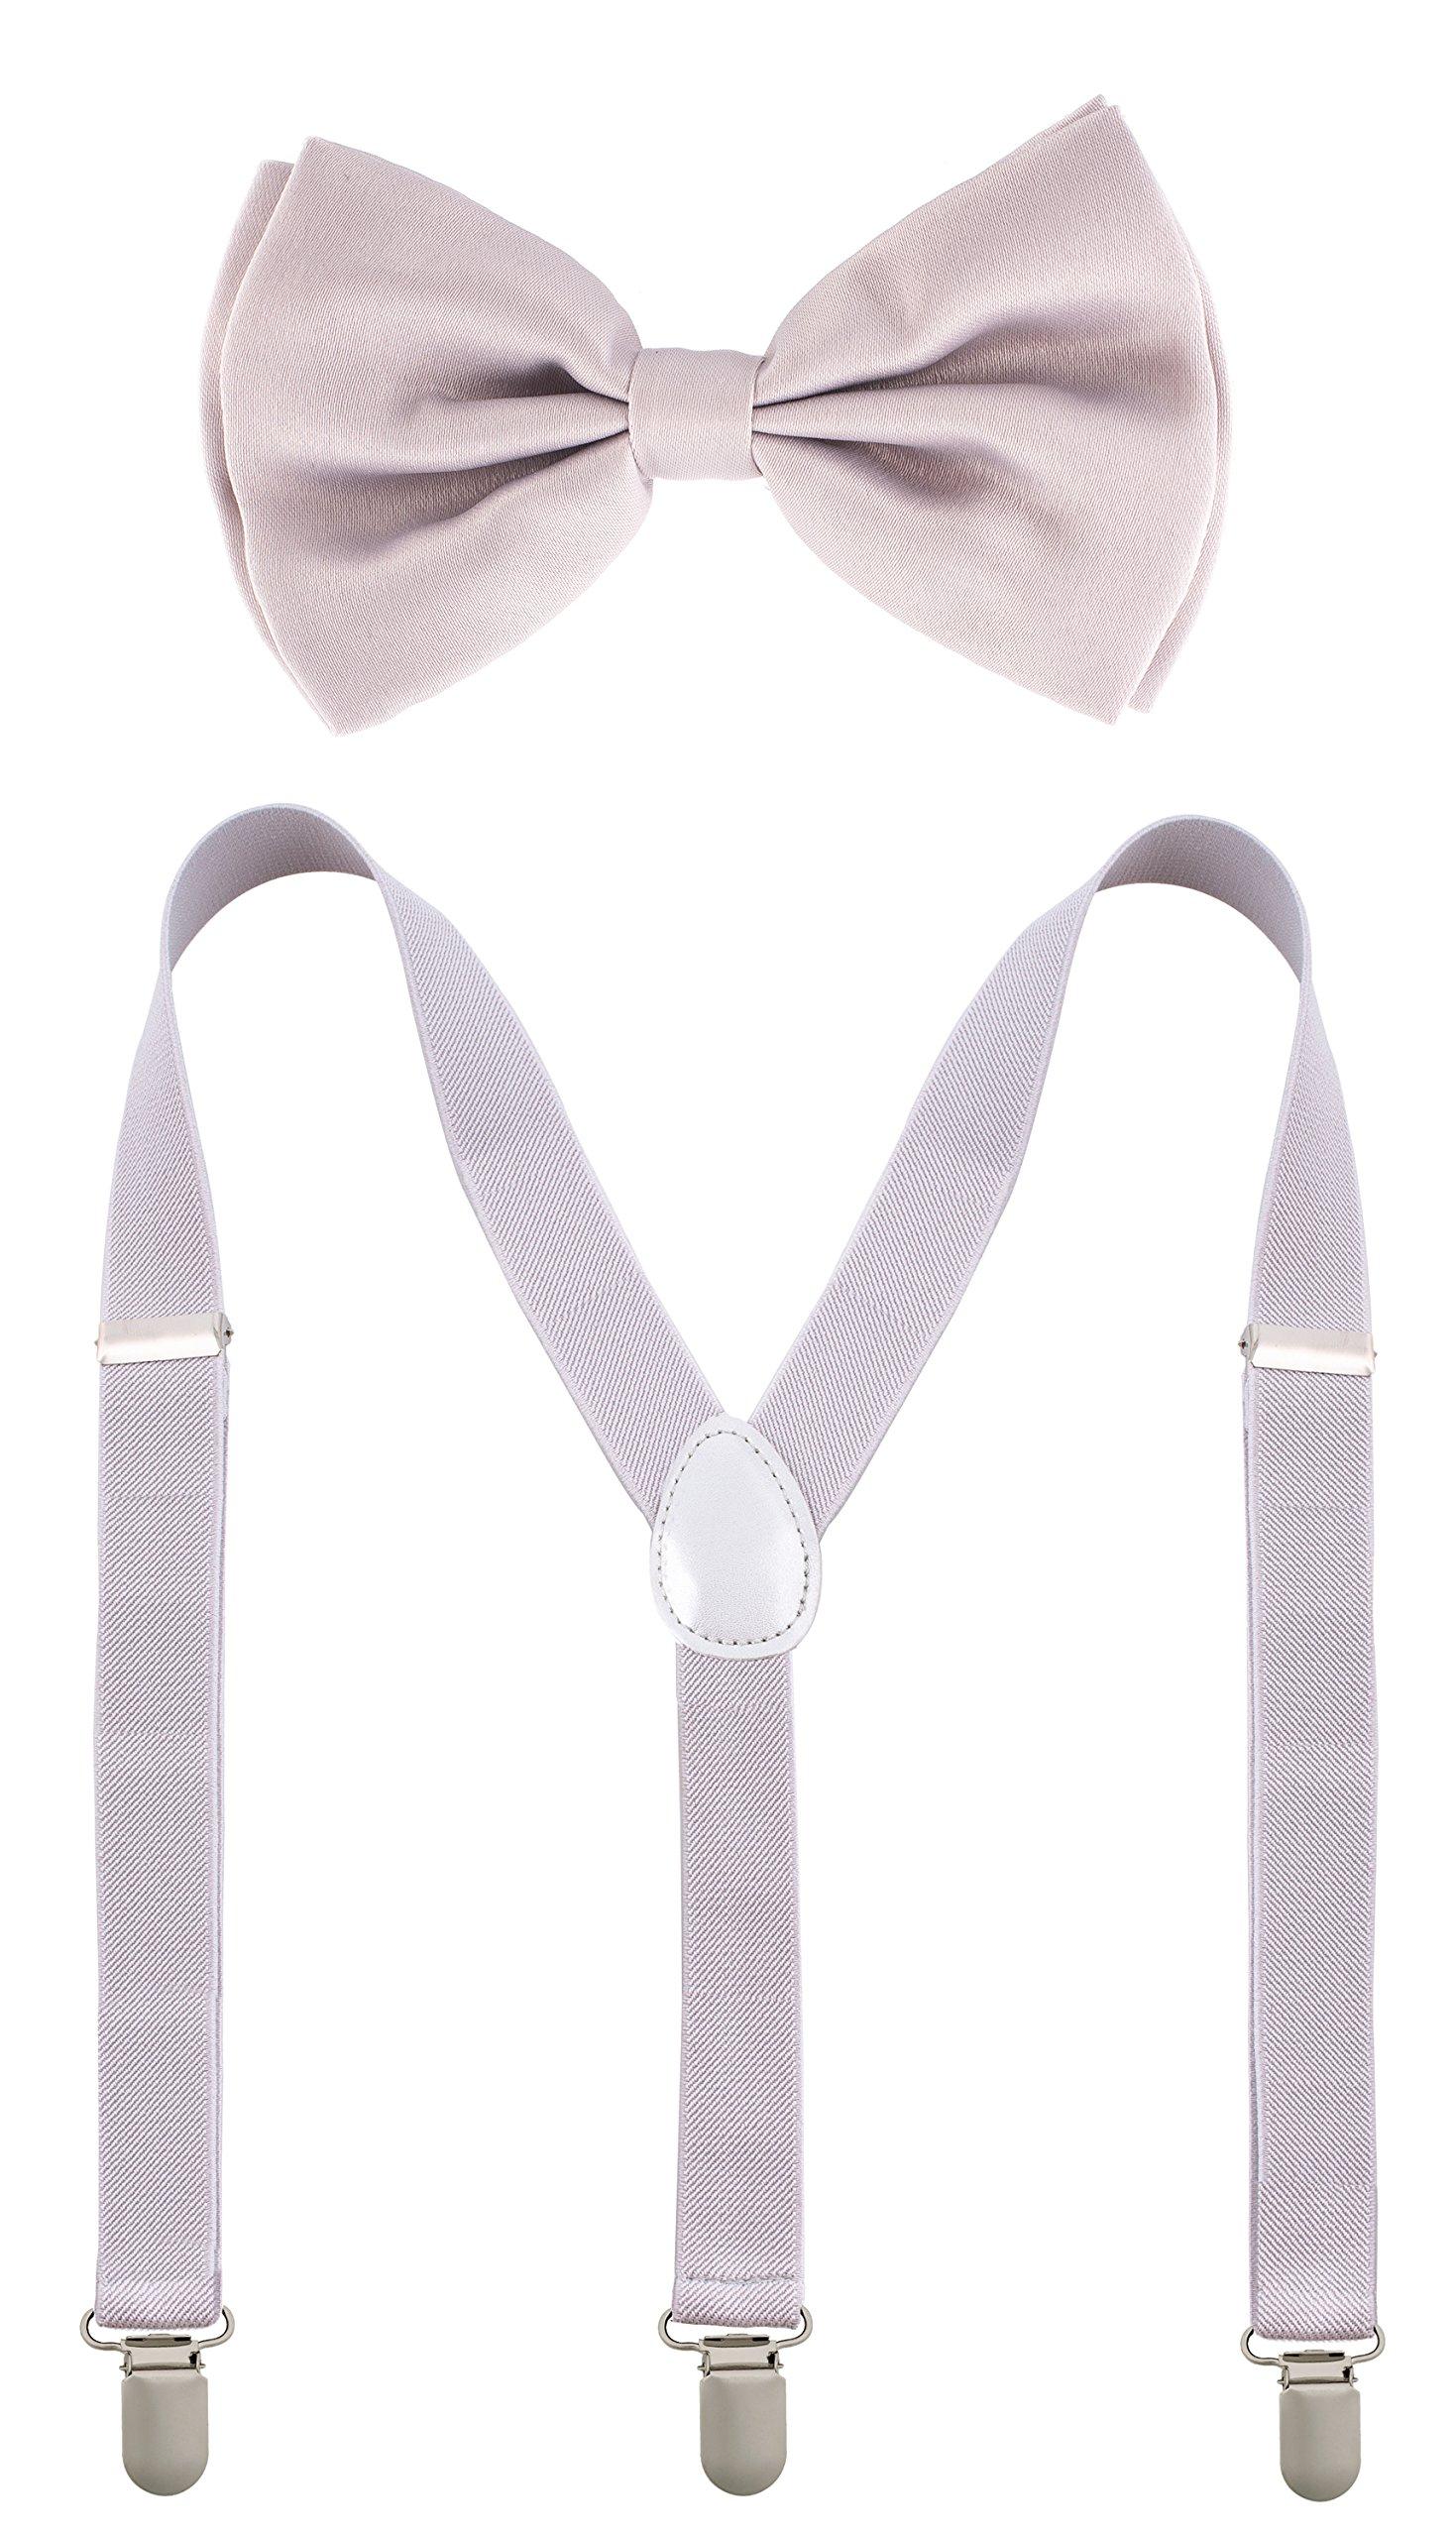 Man of Men - Bowtie & Suspenders Sets - Pastel Colors (Light Grey) by Man of Men